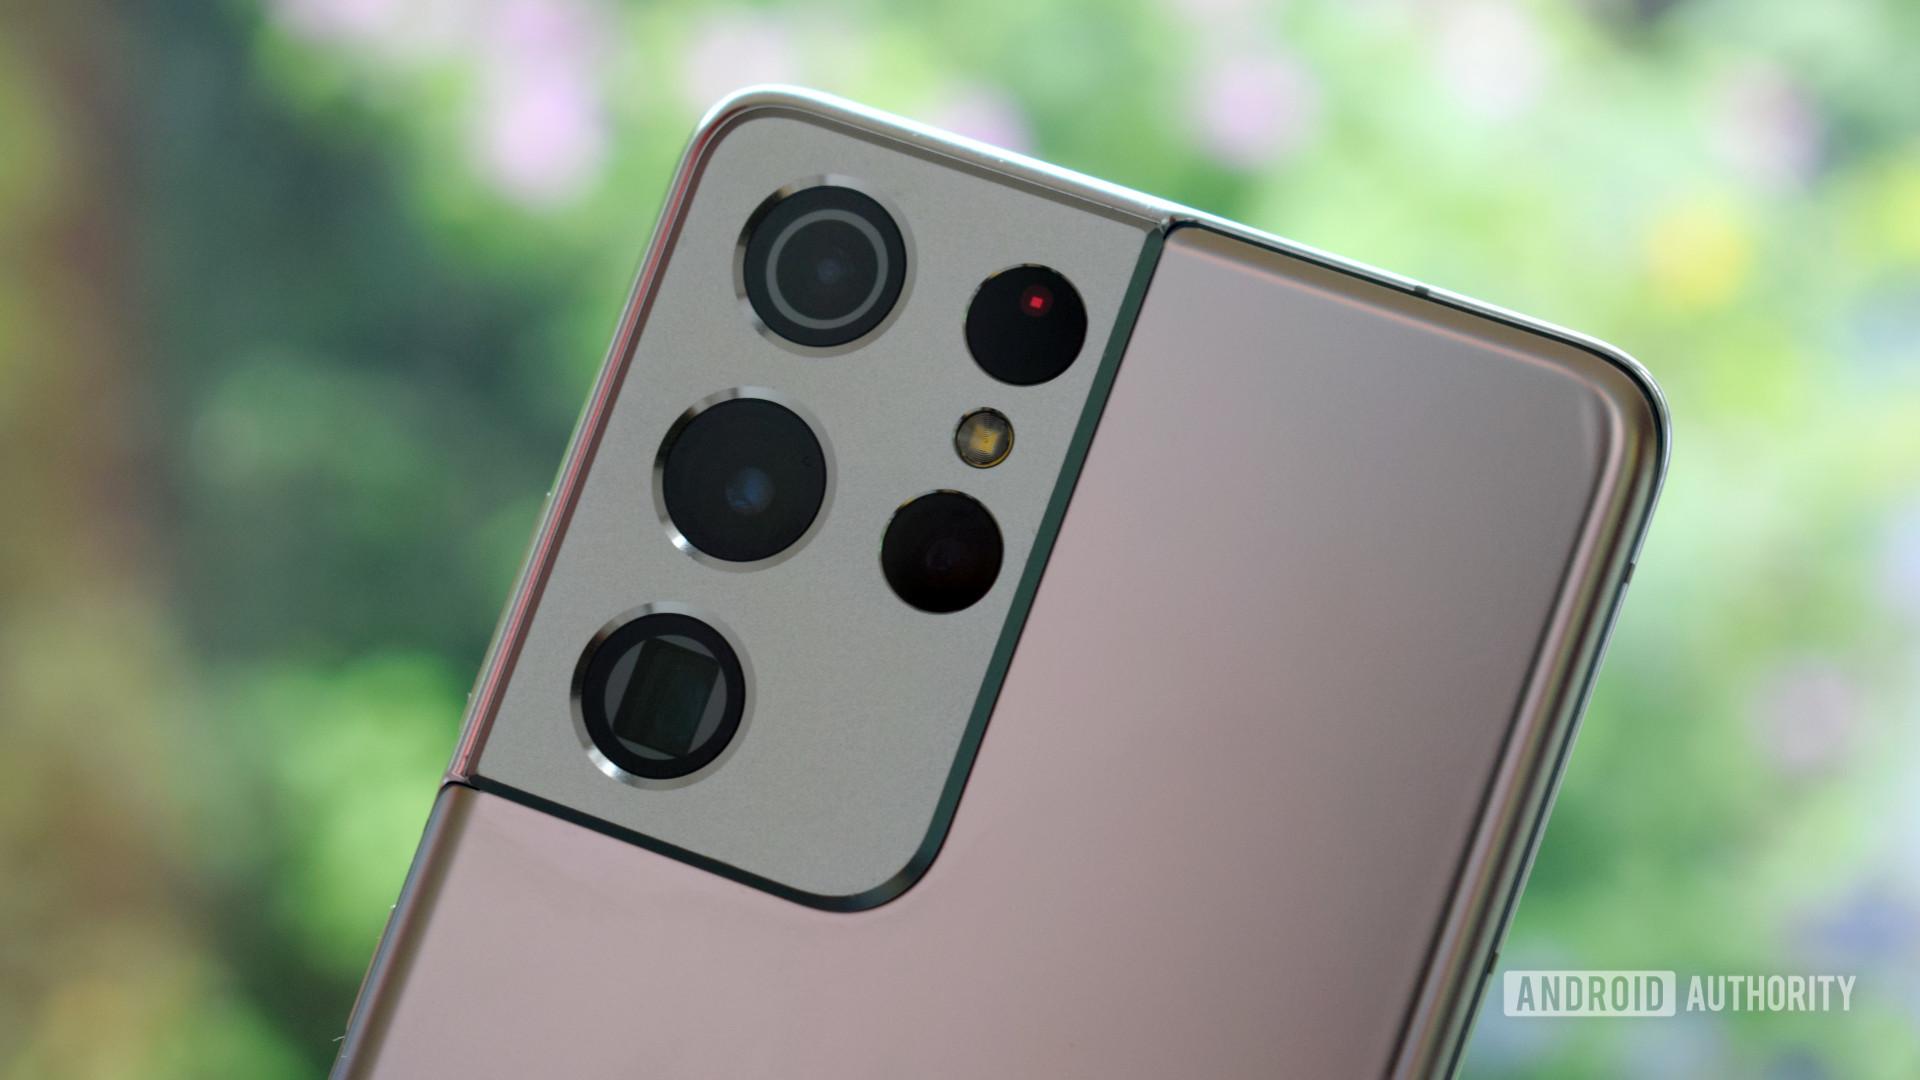 Samsung Galaxy S21 Ultra camera housing close